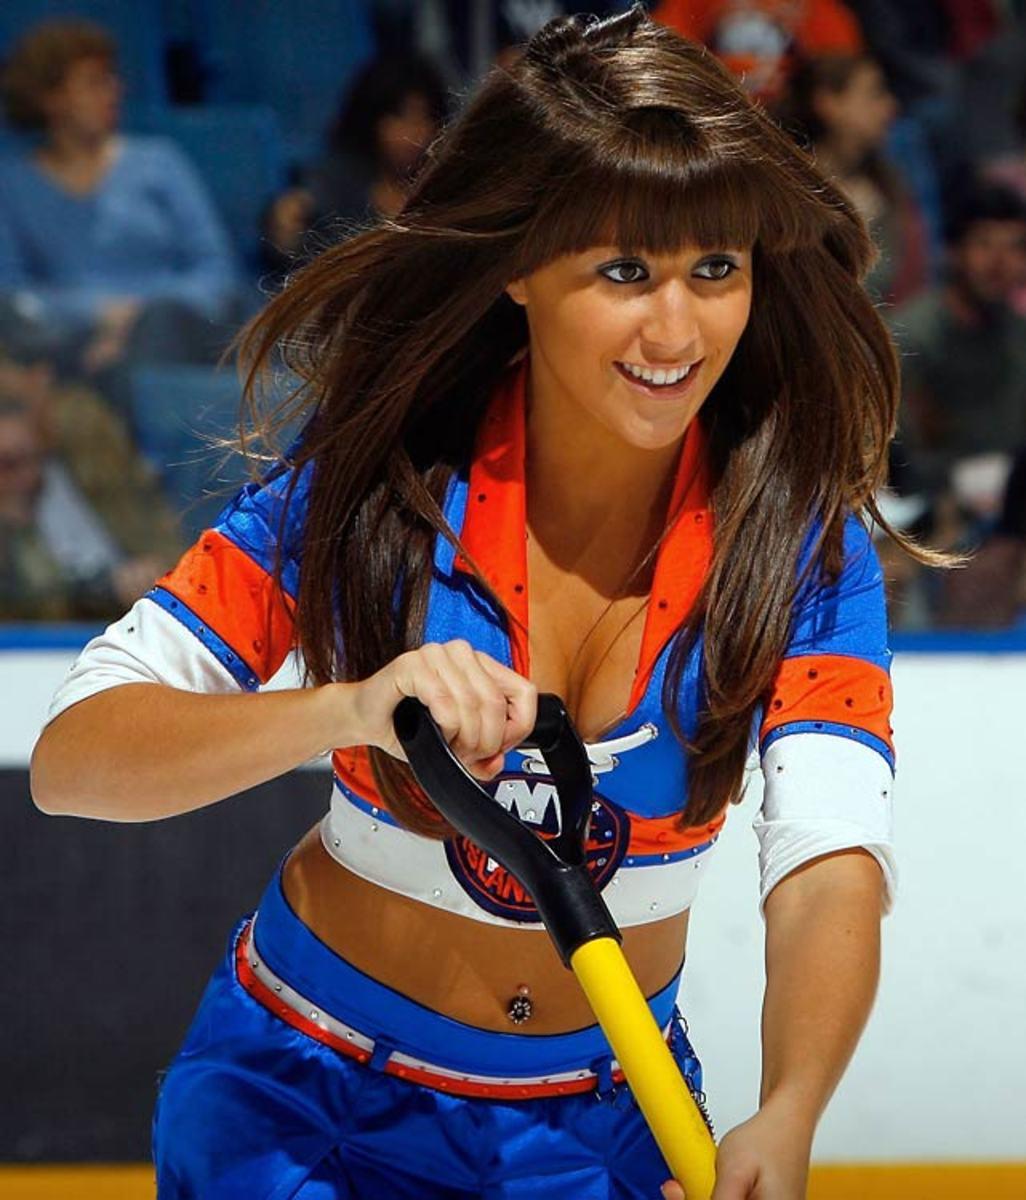 islanders-ice-girl%2801%29.jpg